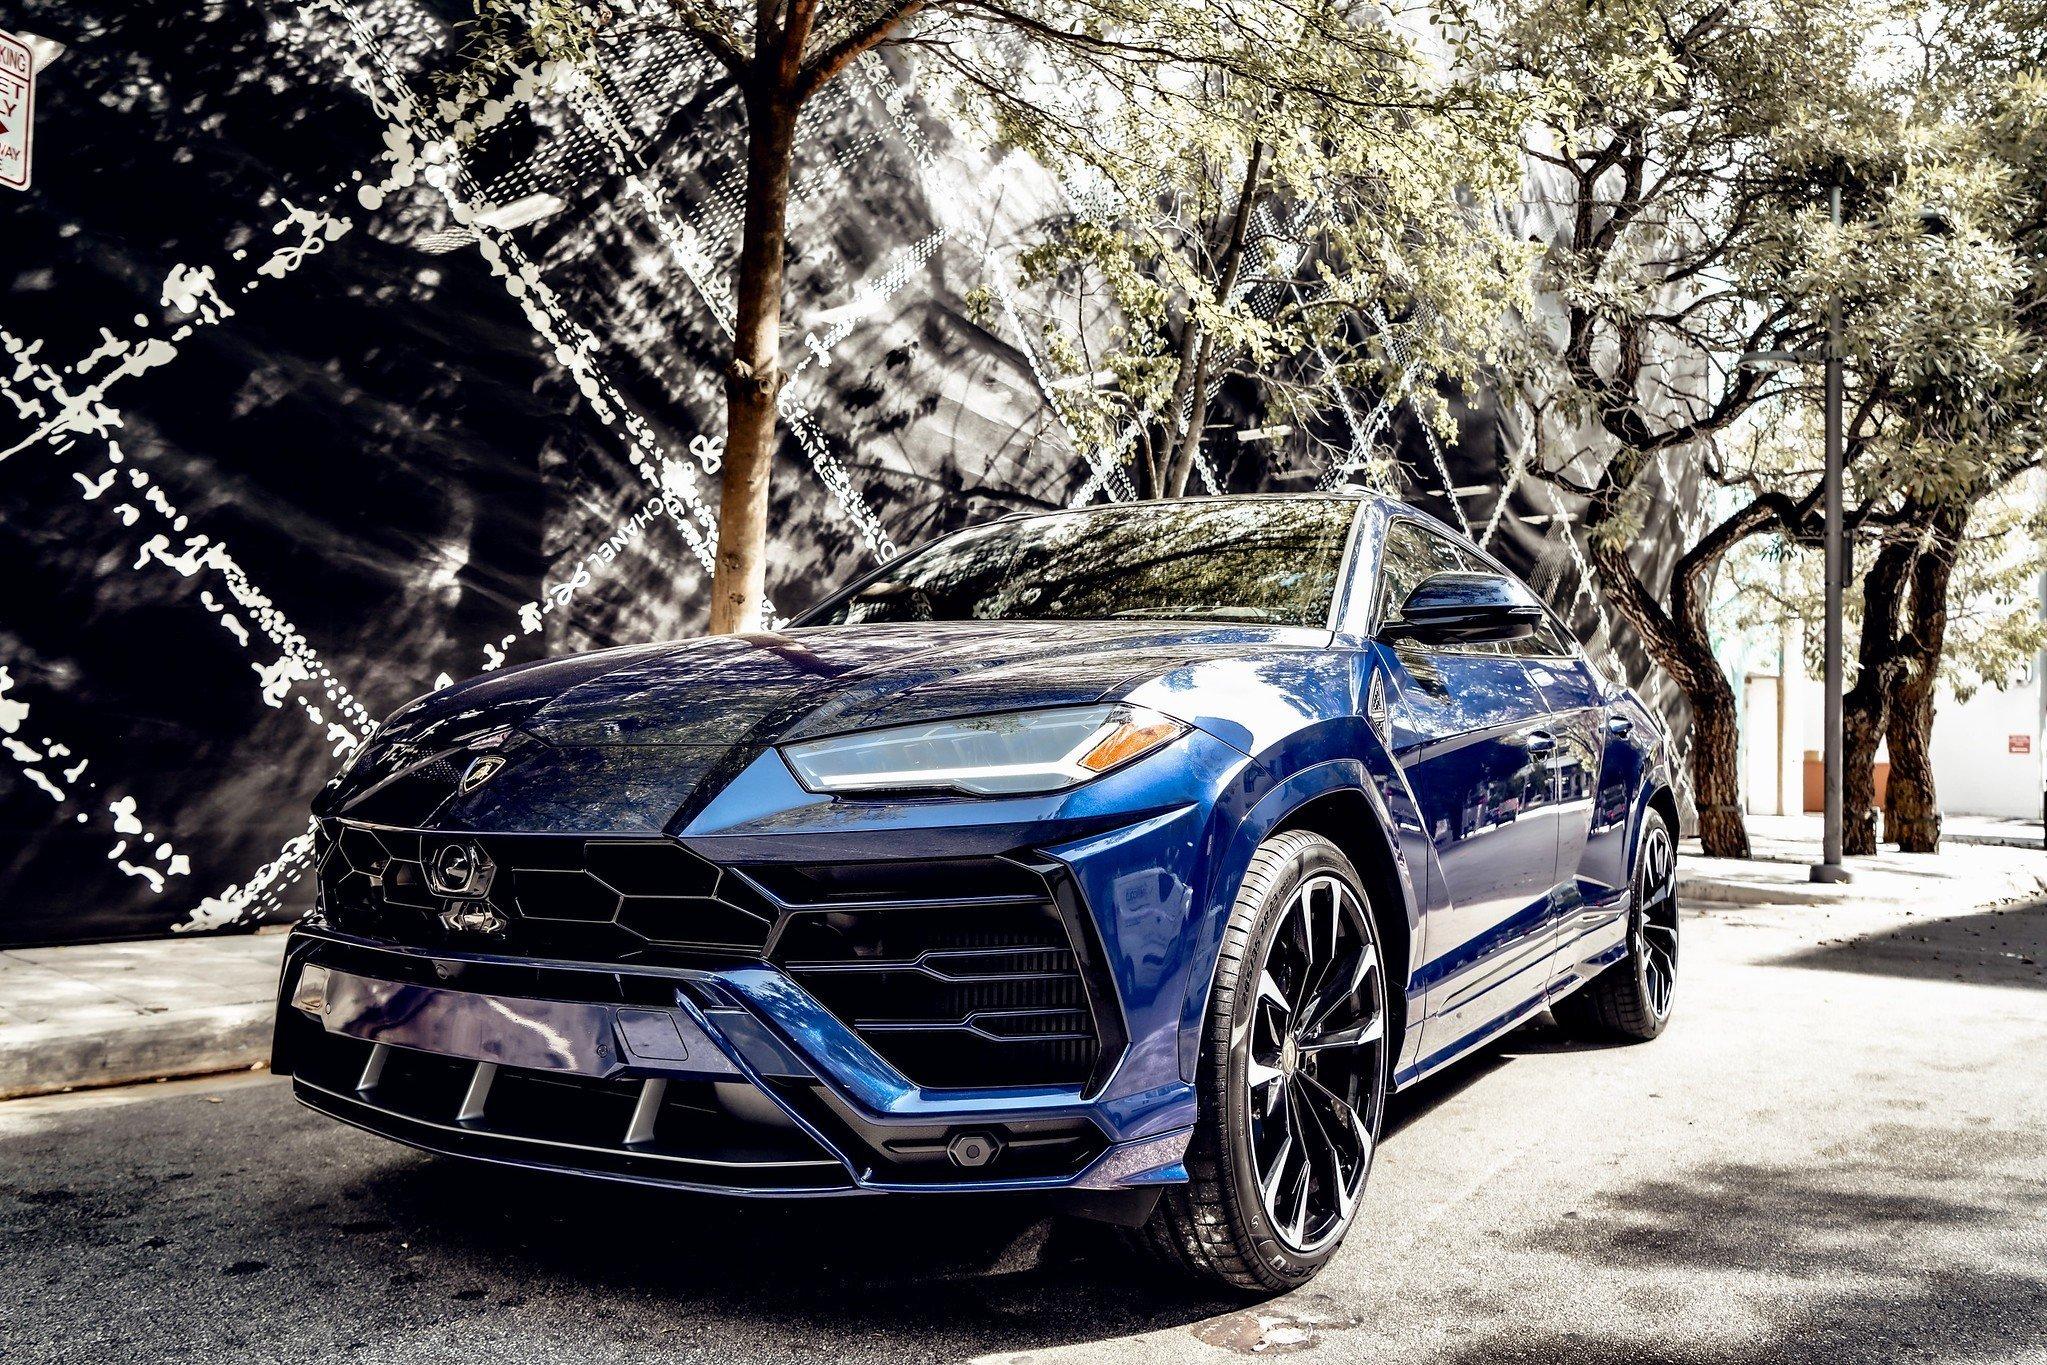 Image #5 of our  2021 Lamborghini Urus - Dark Blue    In Miami Fort Lauderdale Palm Beach South Florida